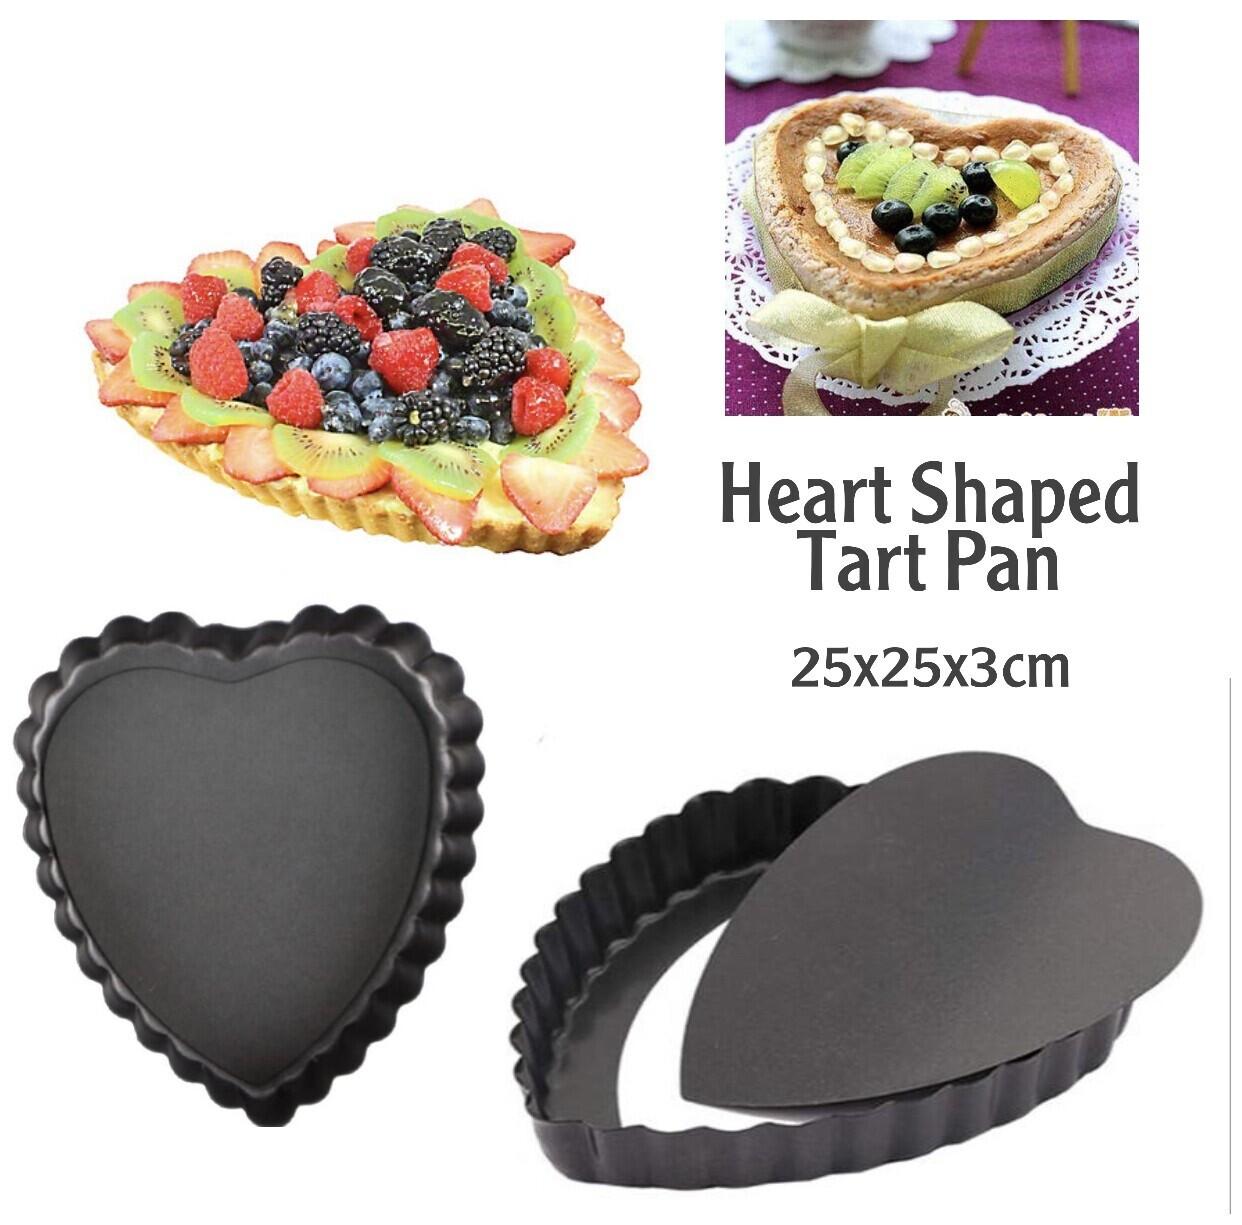 Heart Shaped Tart Pan